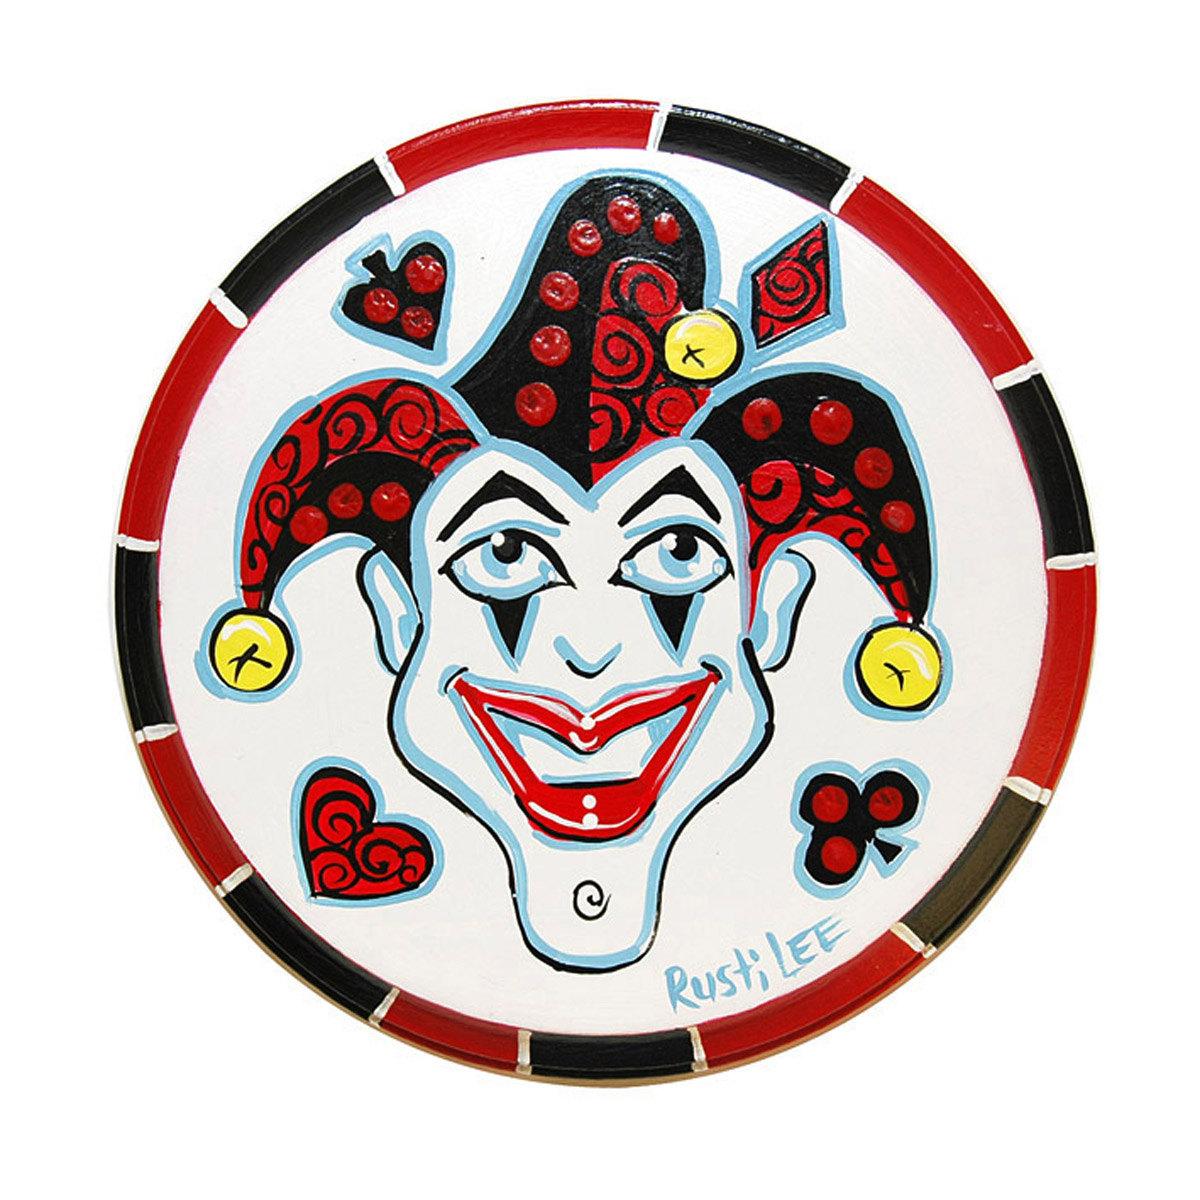 1200x1200 Poker Clip Art